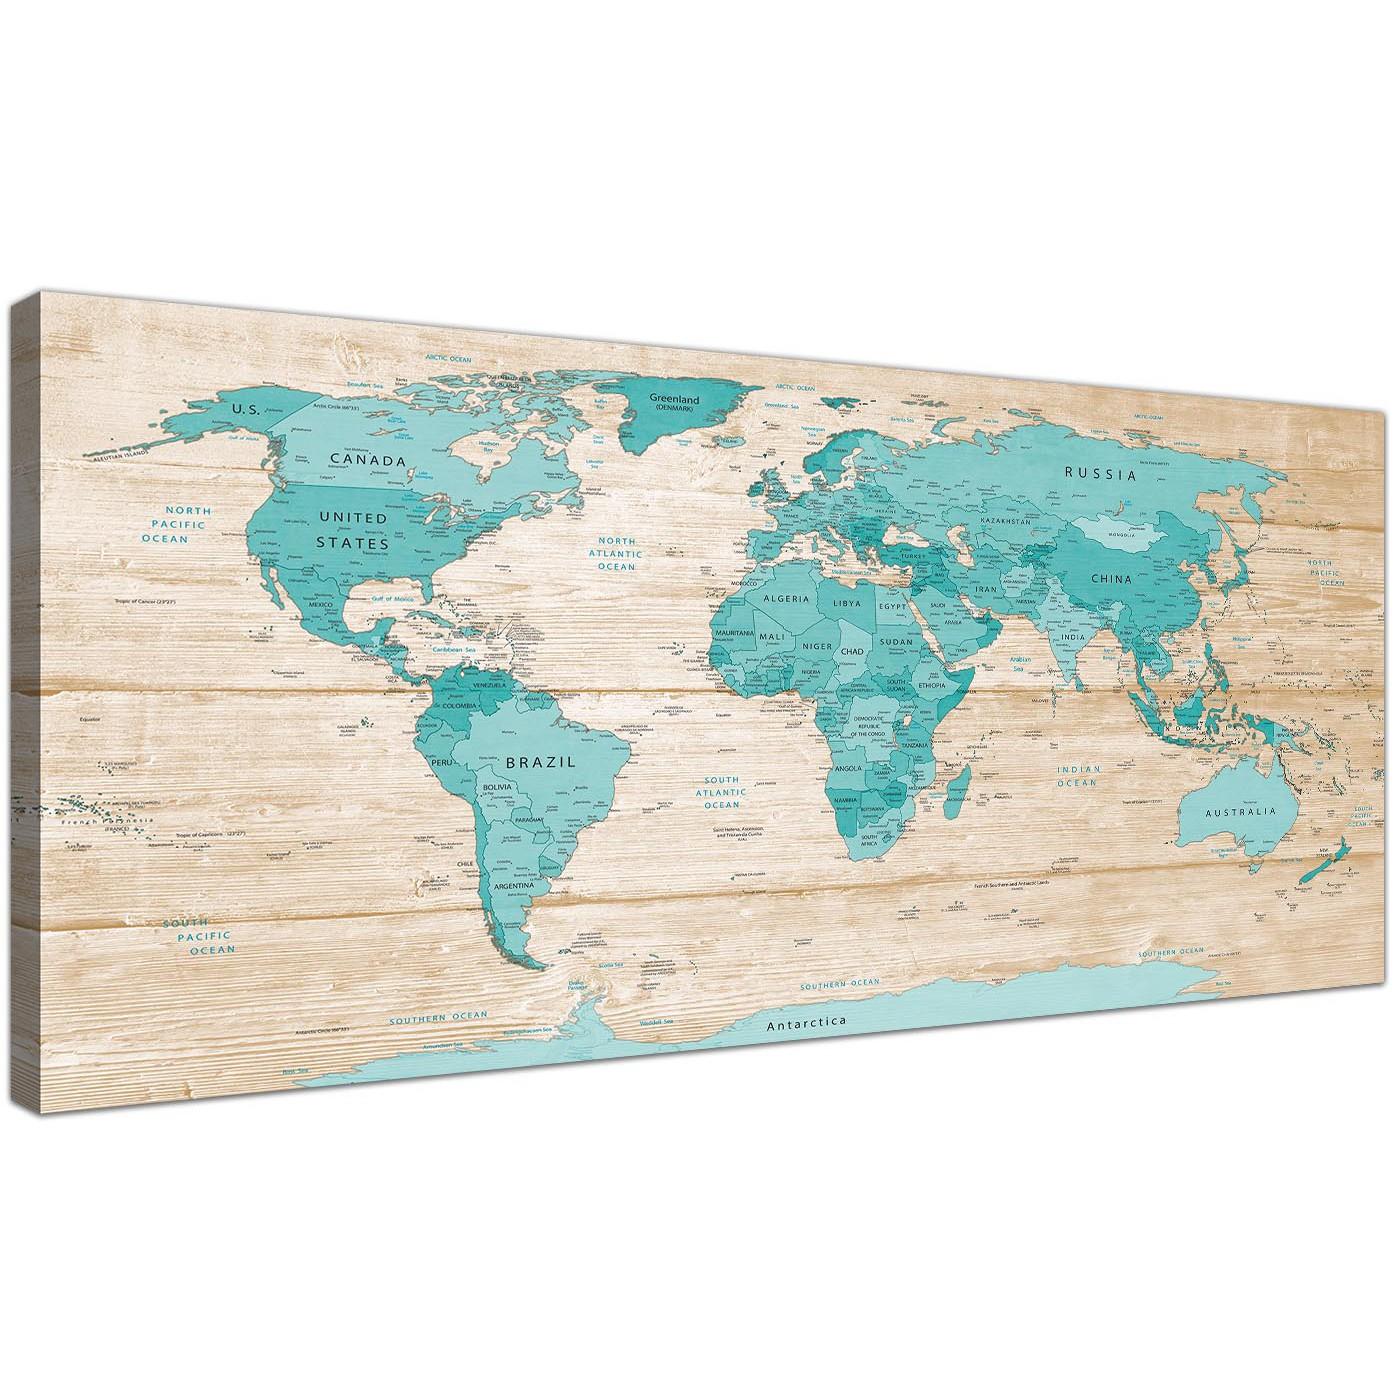 Large Teal Cream Map Of World Atlas Canvas Wall Art Prints Modern - Oversized map prints